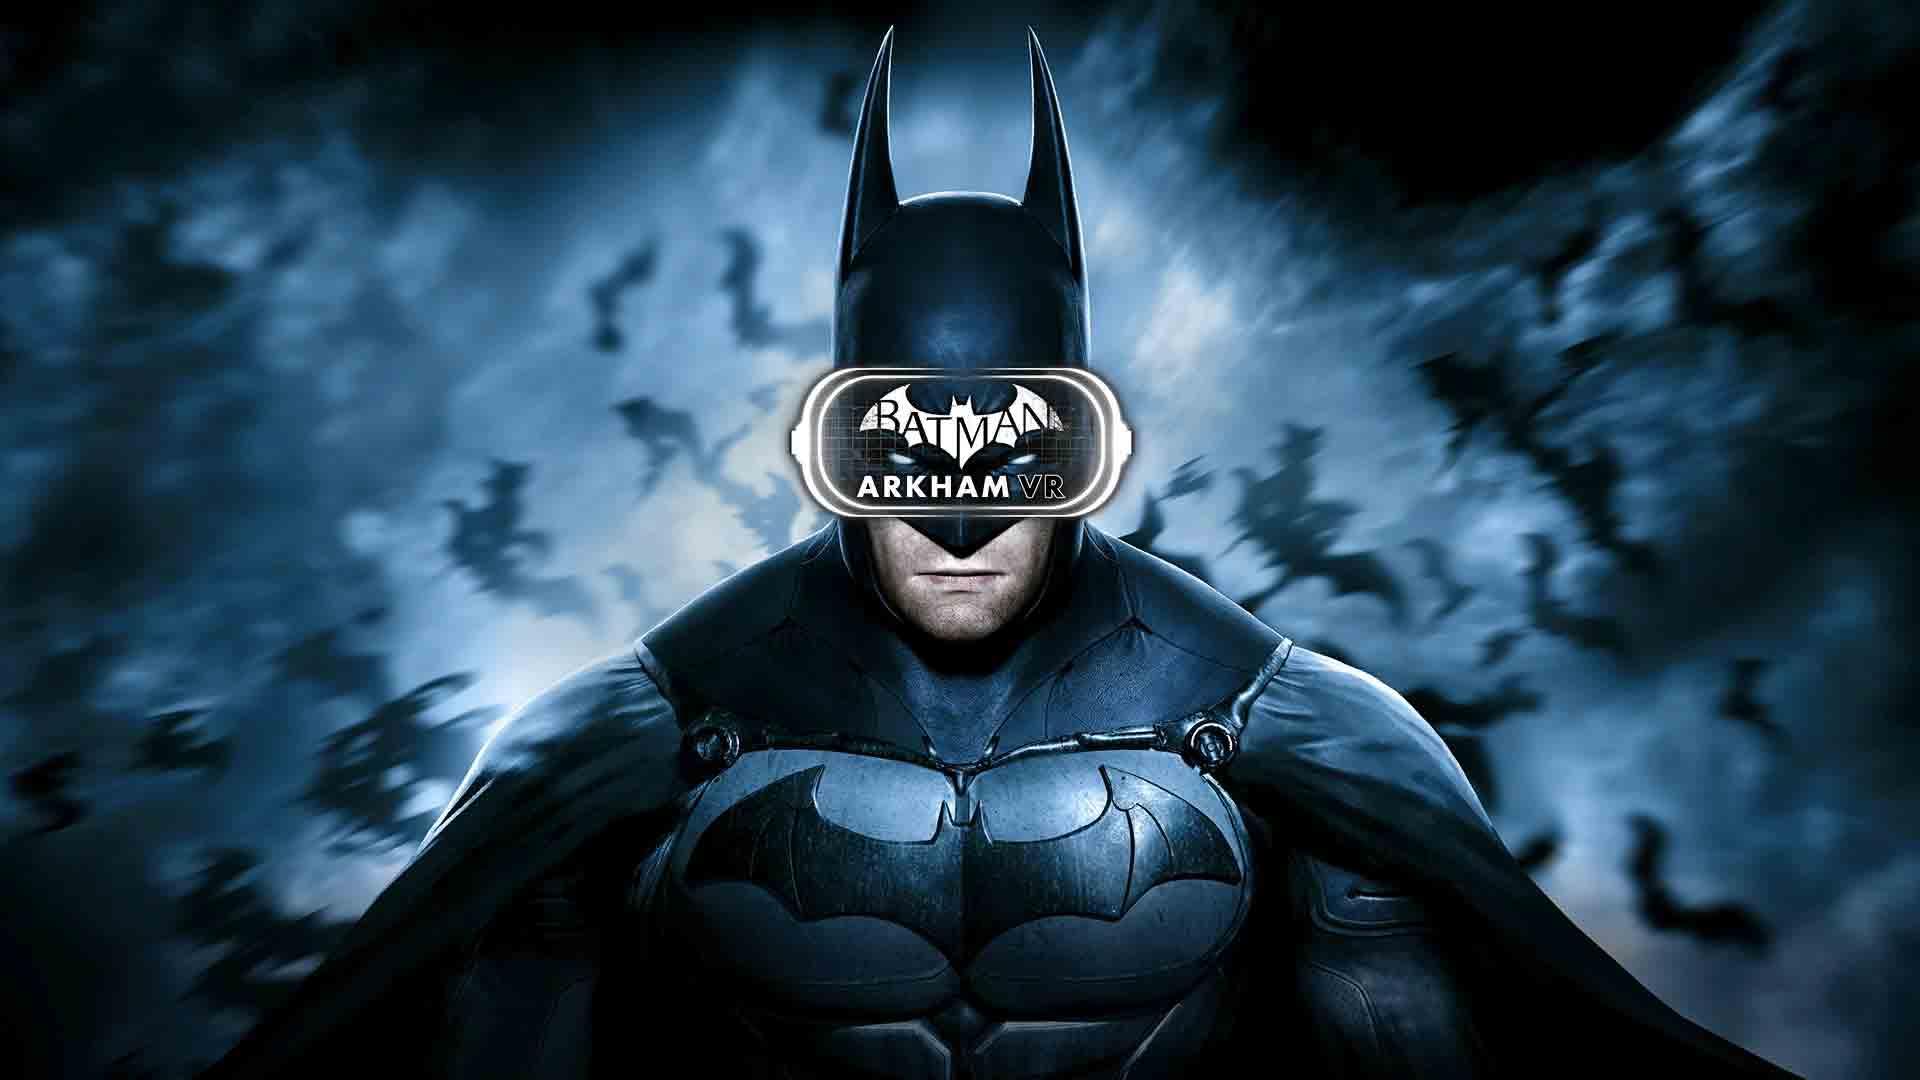 Batman Arkham VR sur PlayStation VR